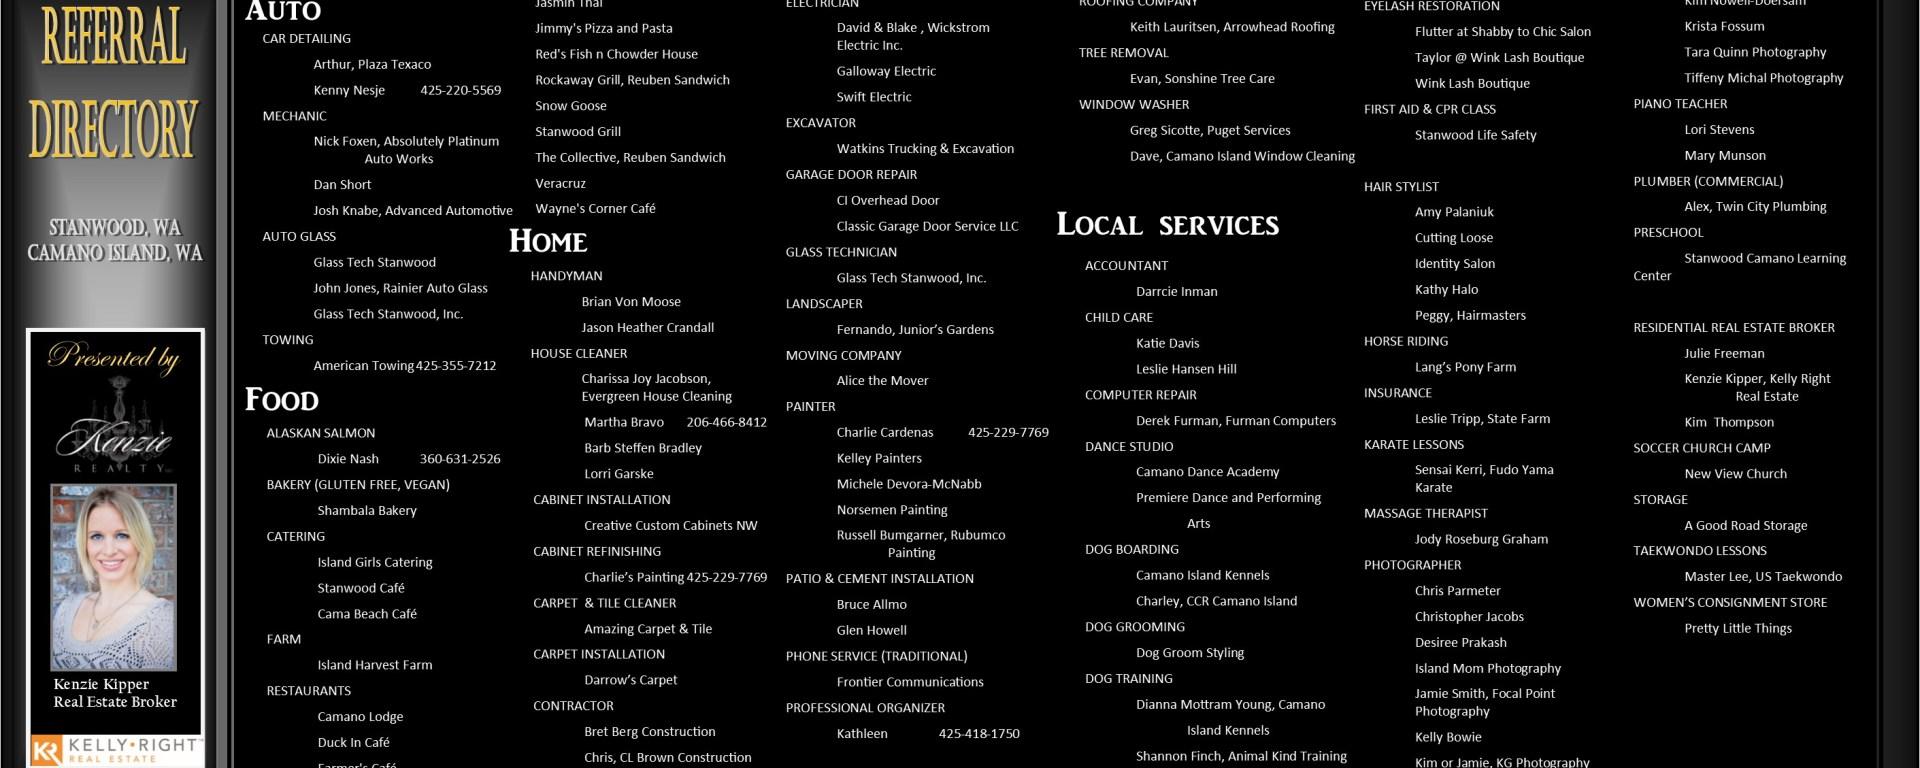 september 2015 referral directory1